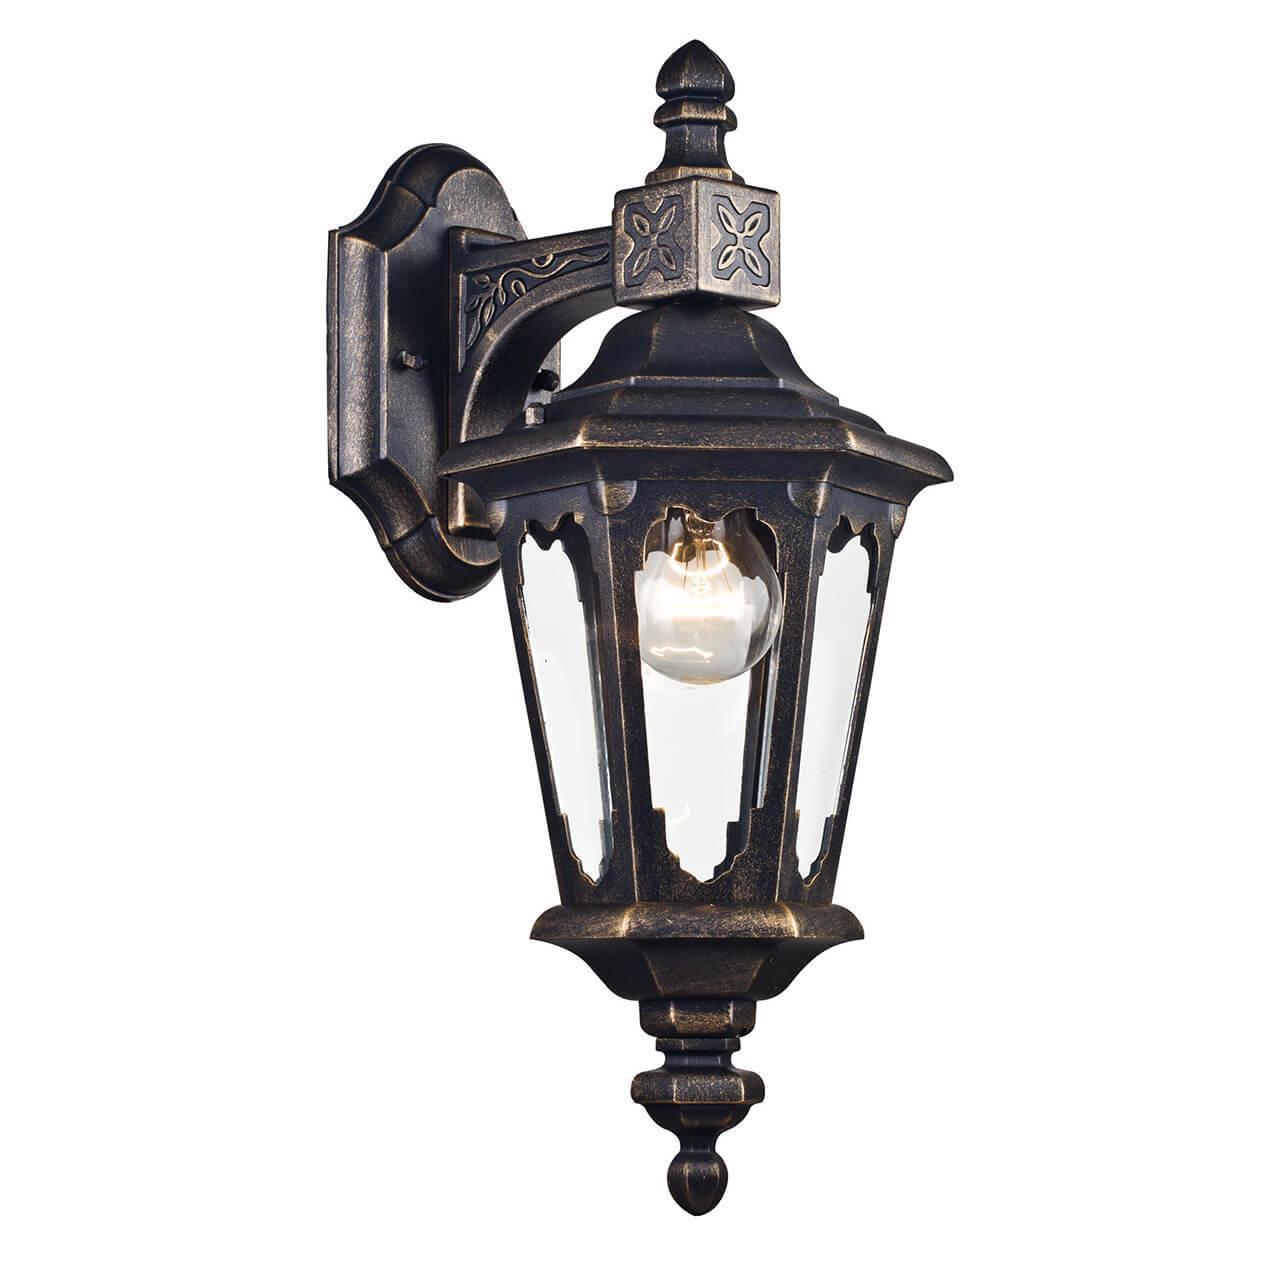 Уличный светильник Maytoni S101-42-01-R, E27